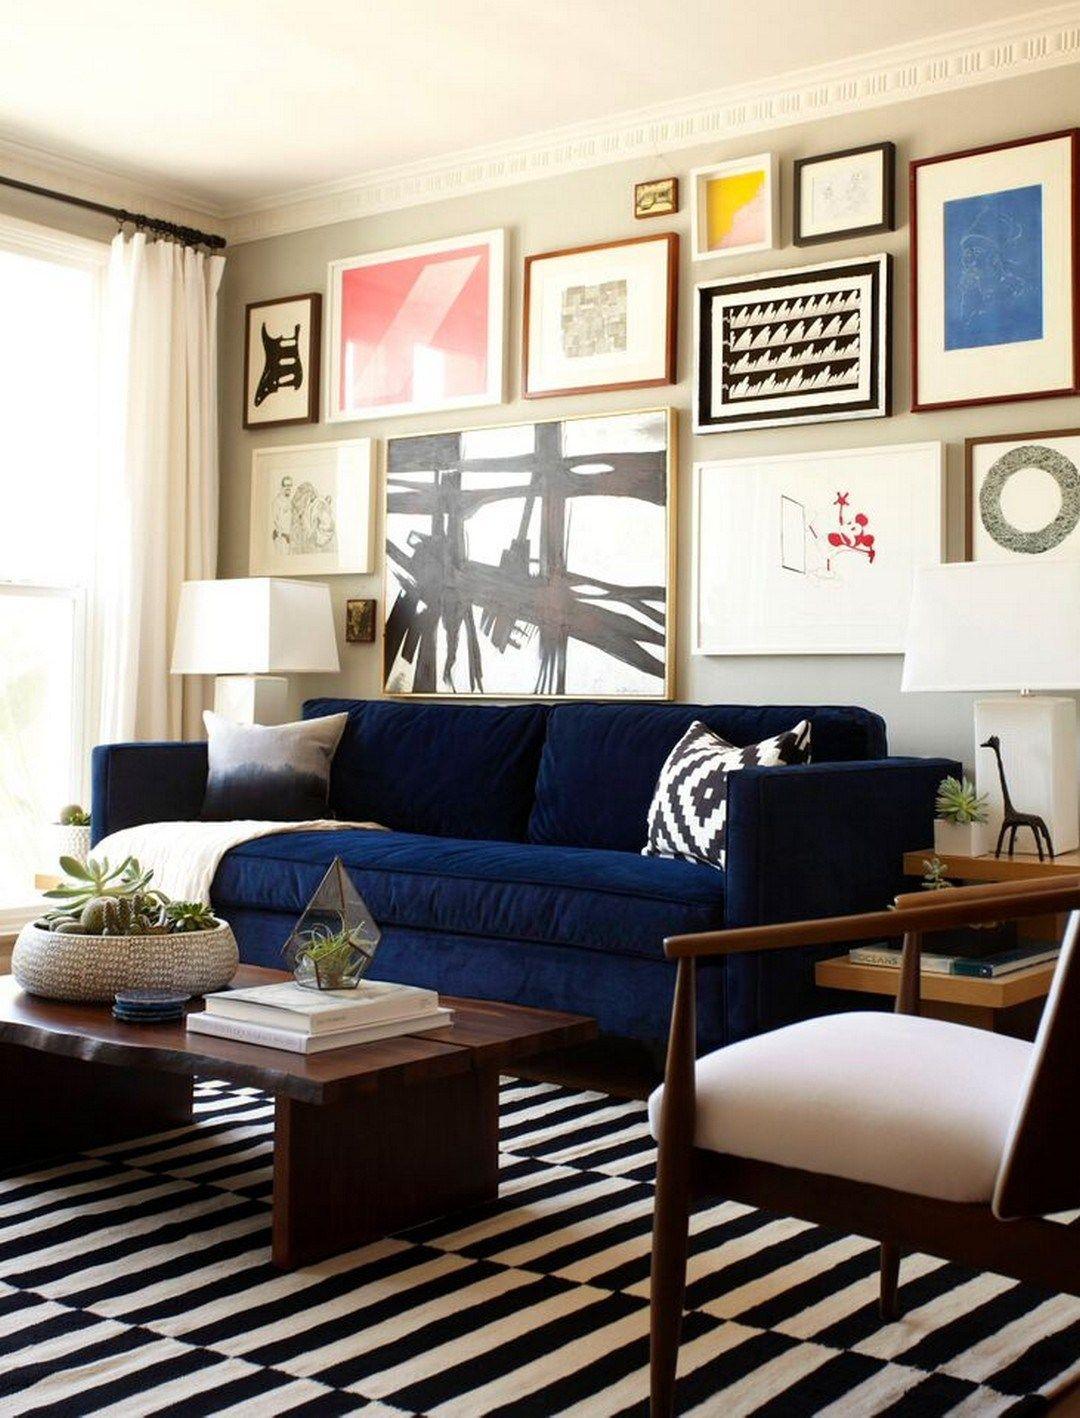 Design My Living Room Online: Mid-Century Modern Interior Decorating Inspiration. See